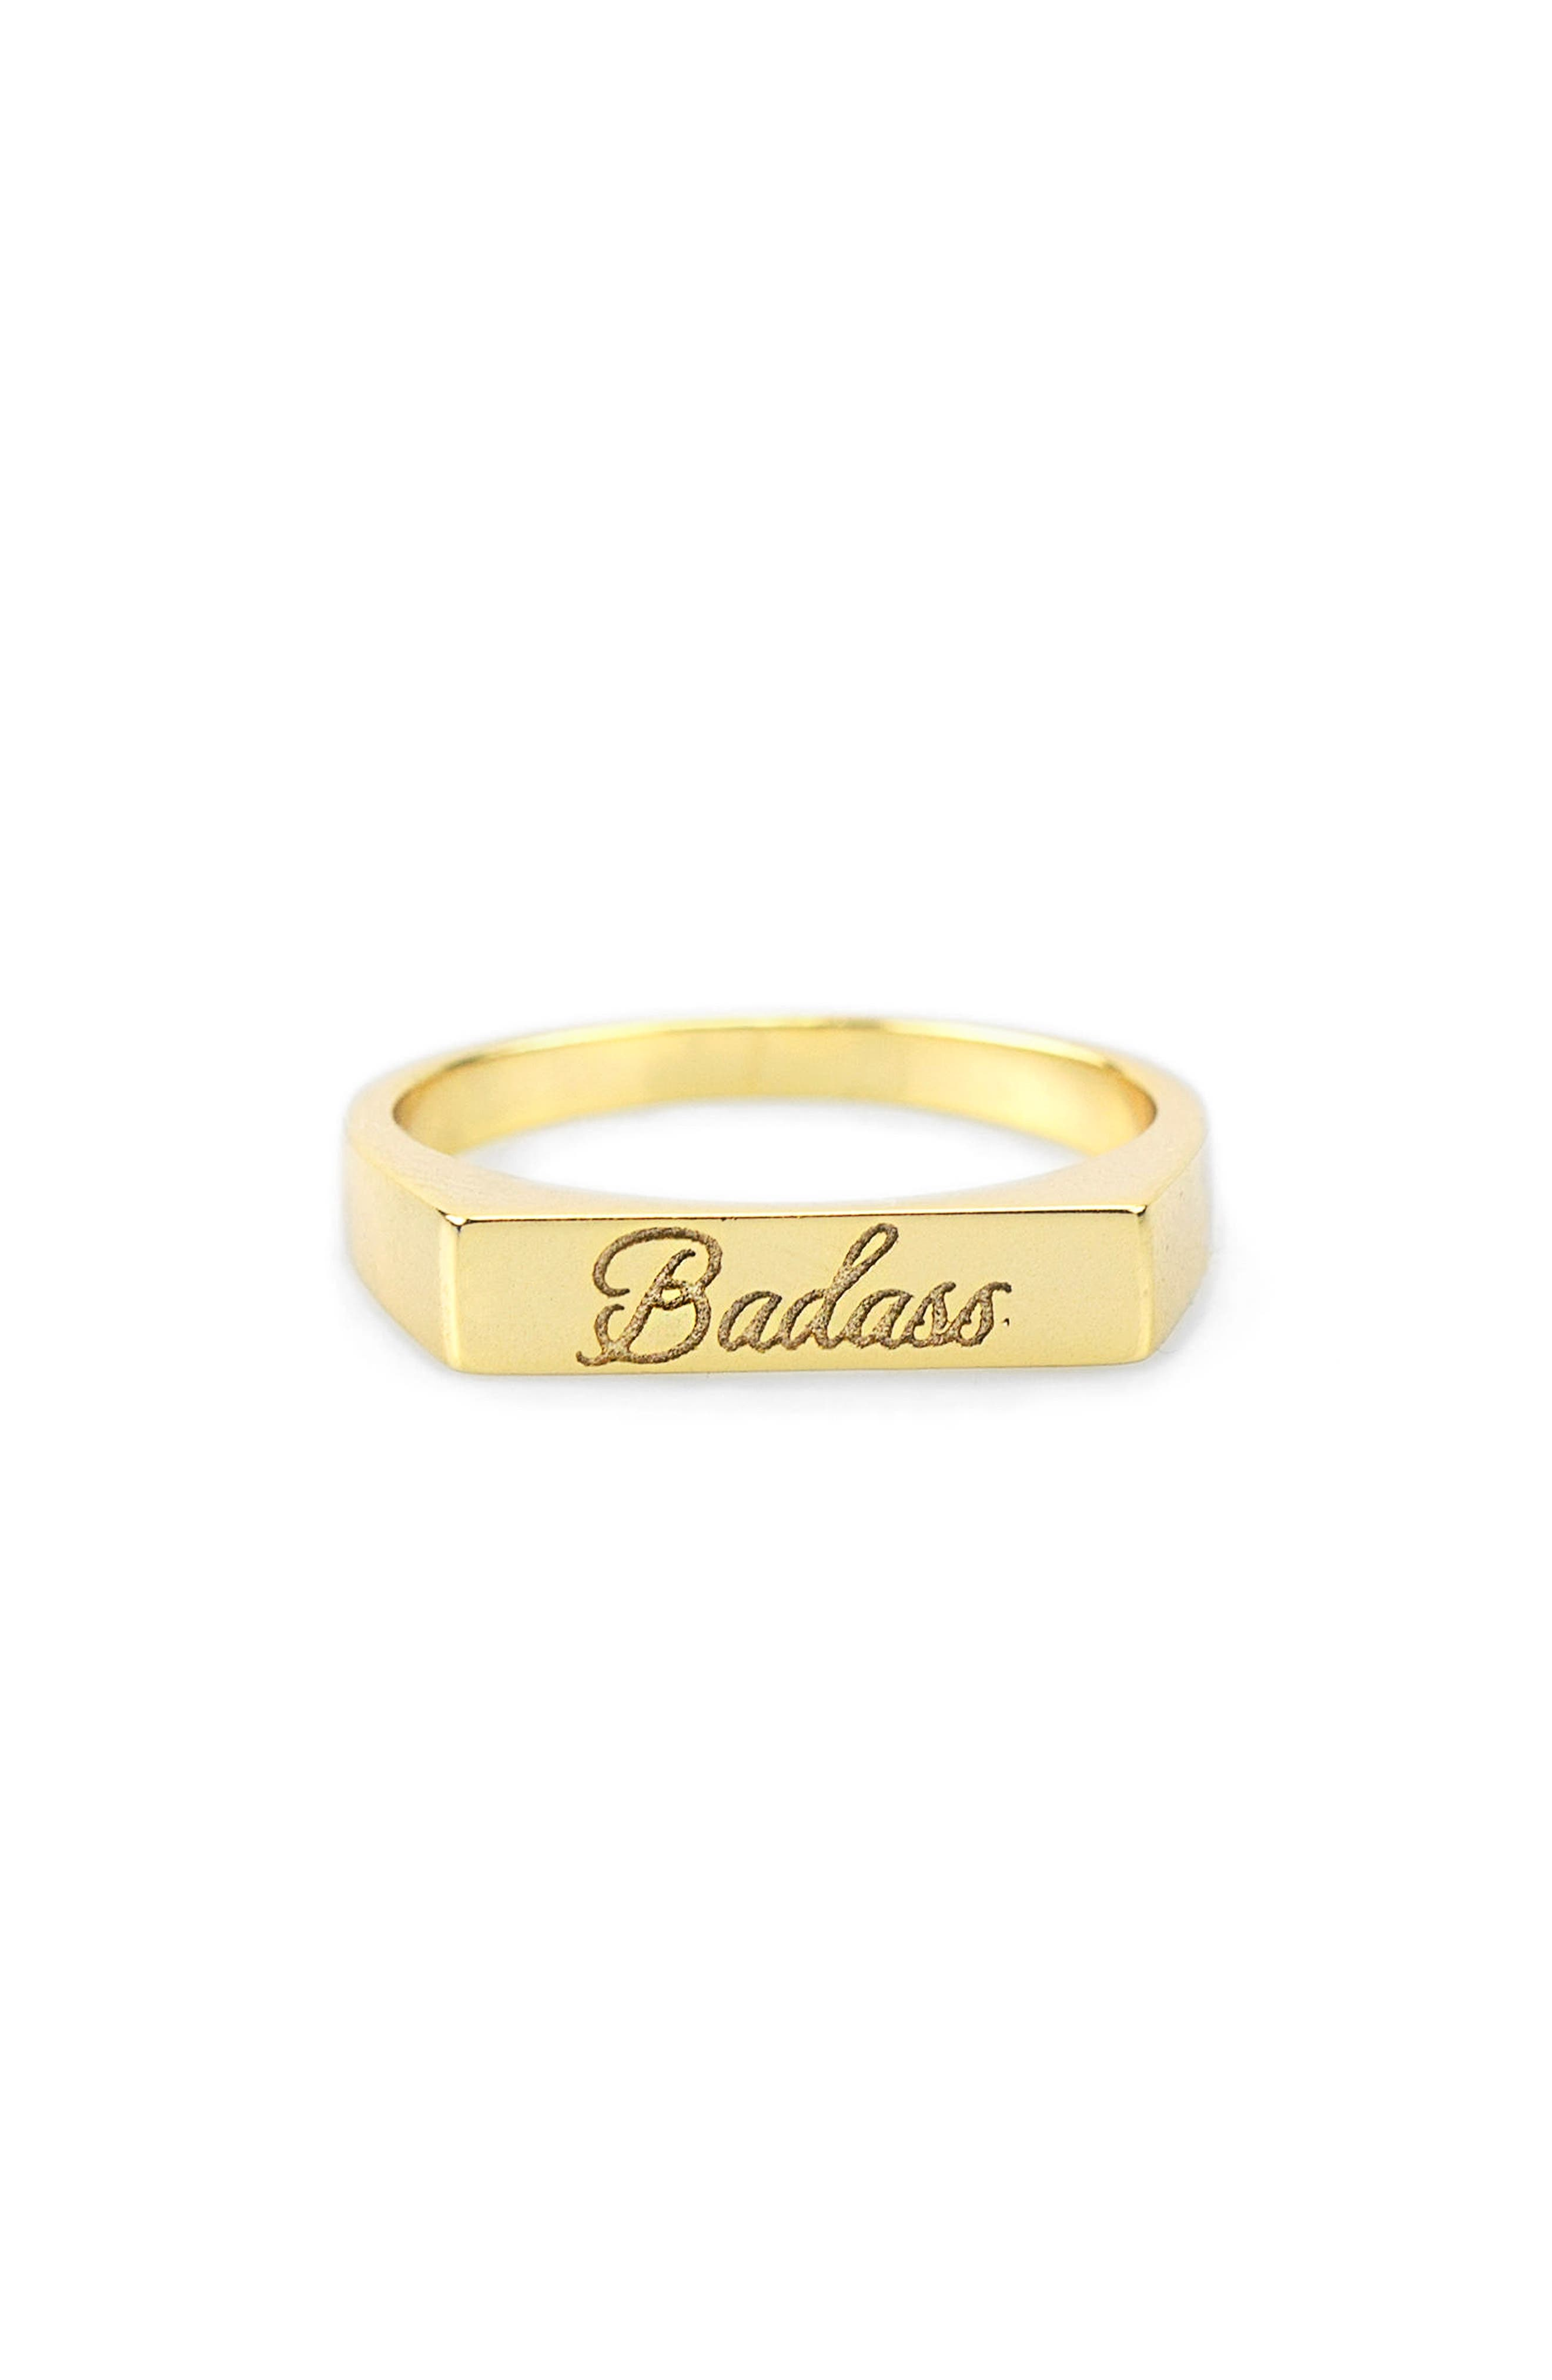 Main Image - Kris Nations Engraved Ring